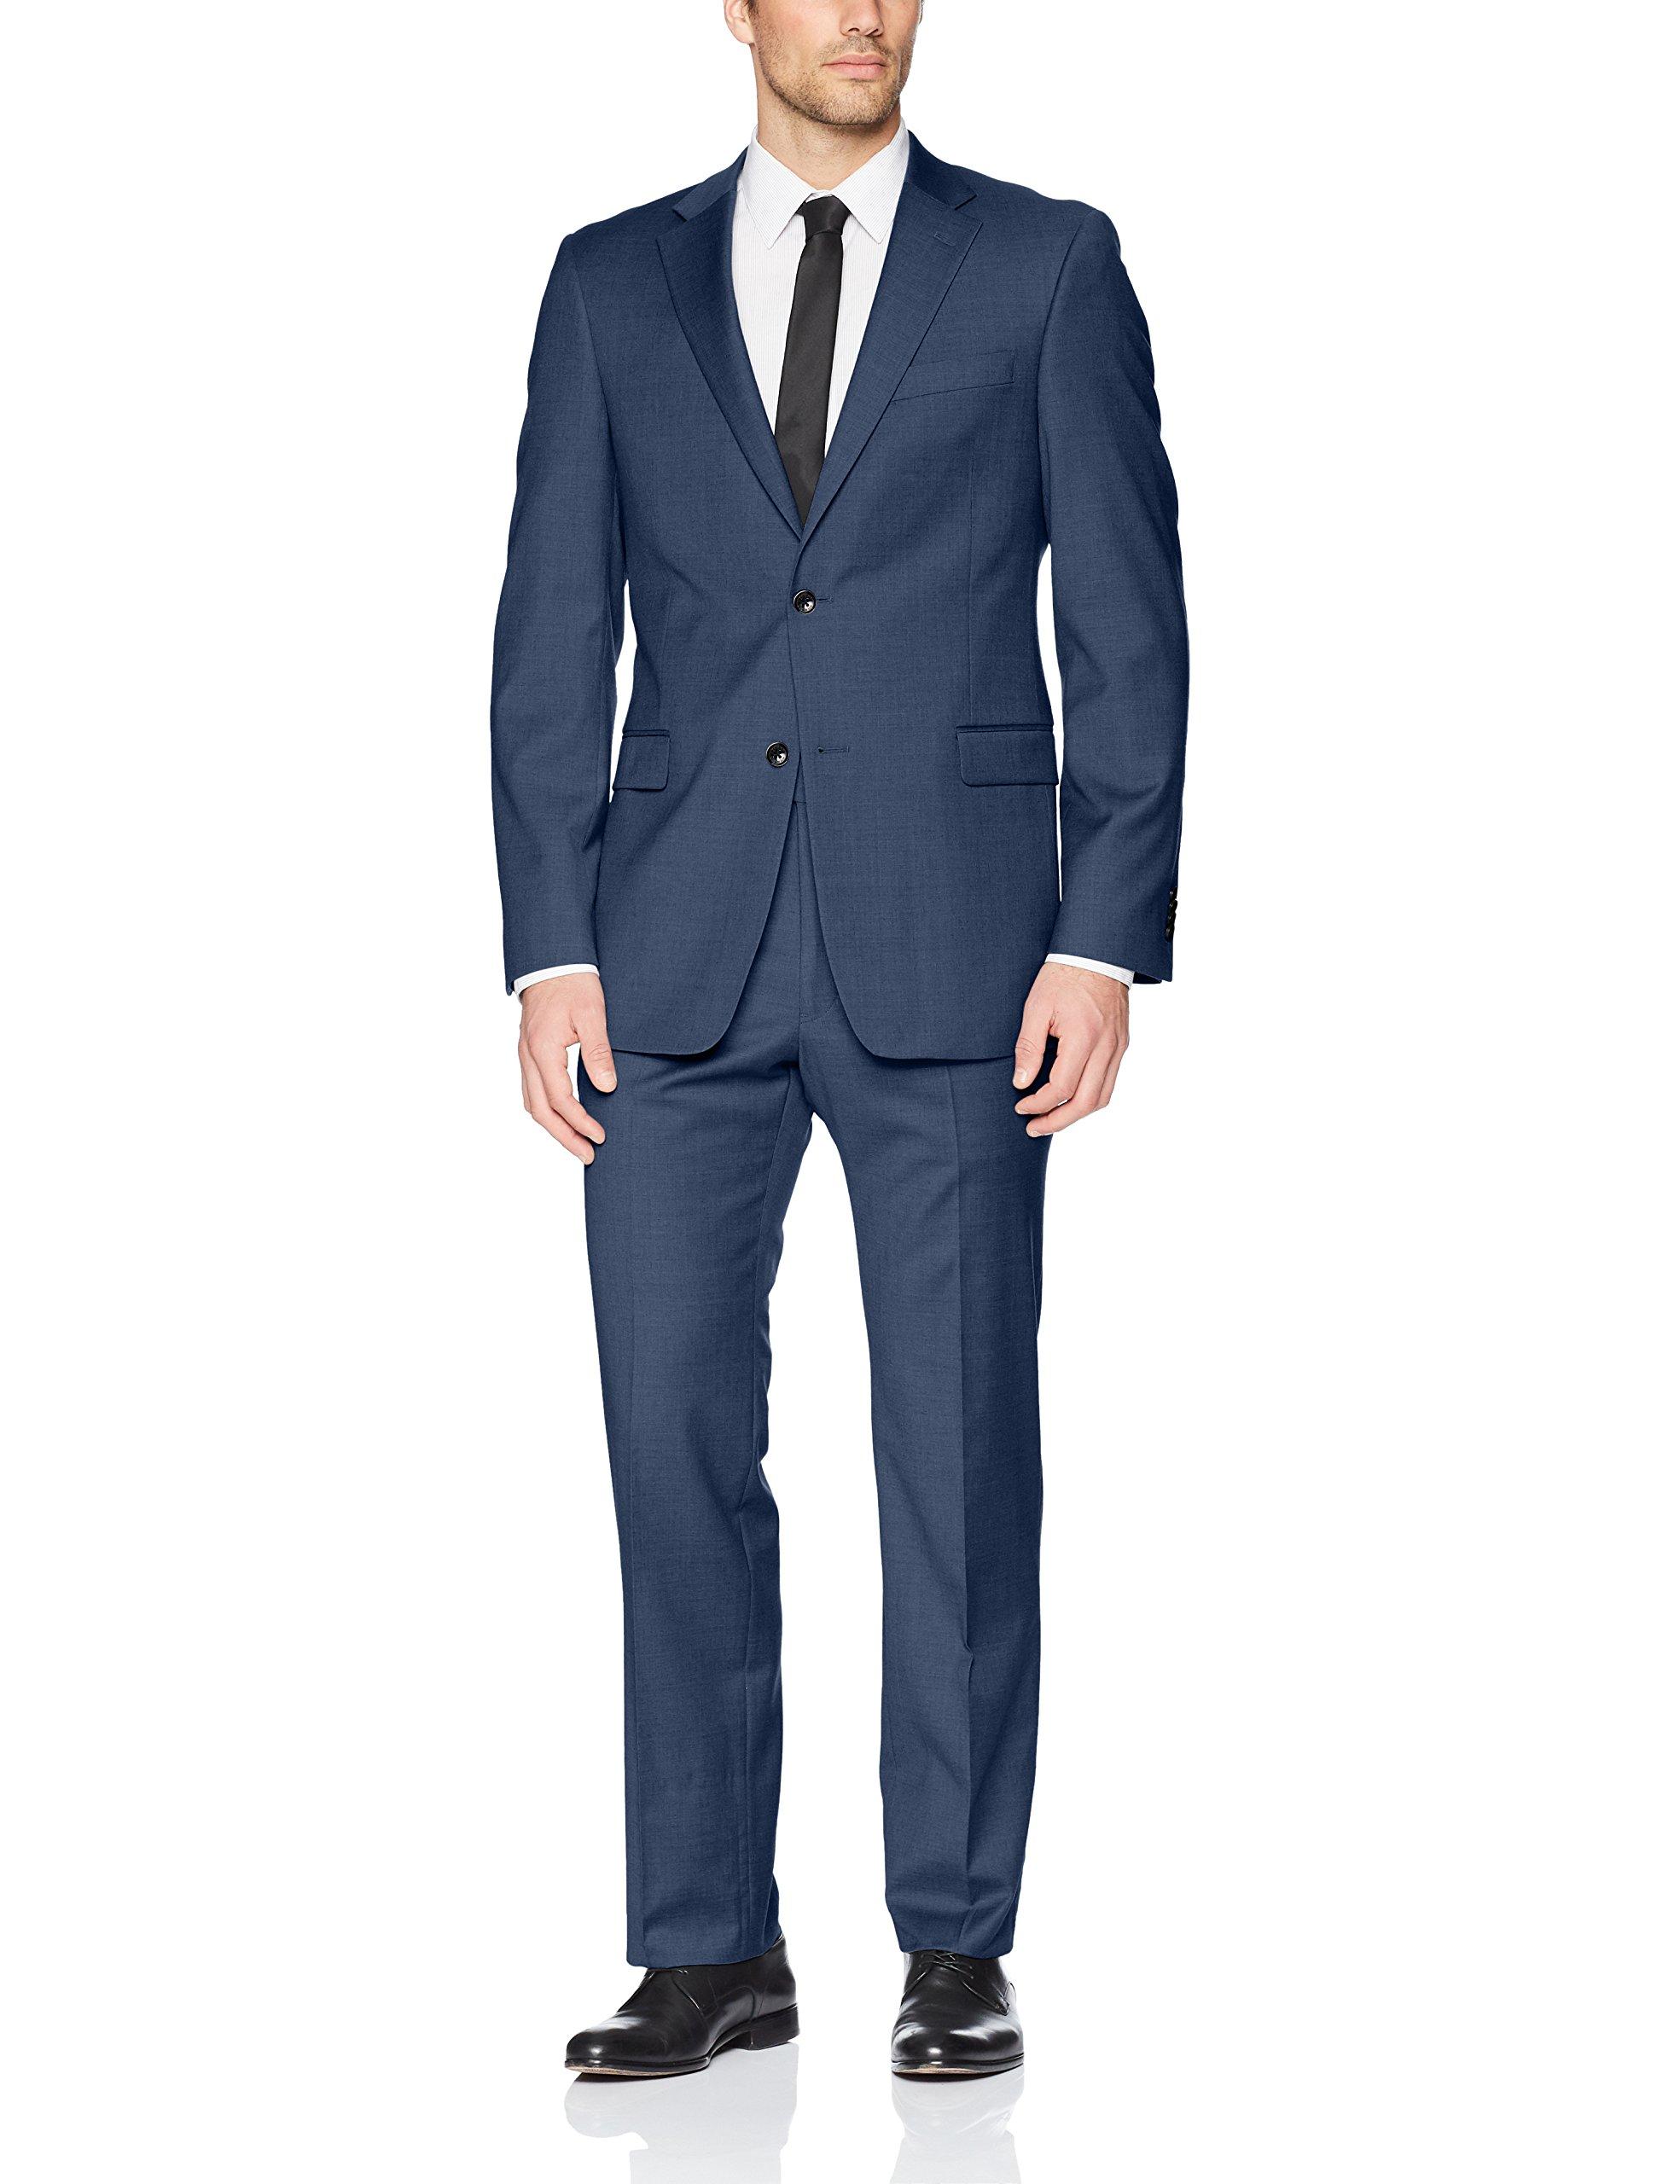 Tommy Hilfiger Men's Modern Fit Performance Suit with Stretch, Blue Sharkskin Pattern 44 Regular